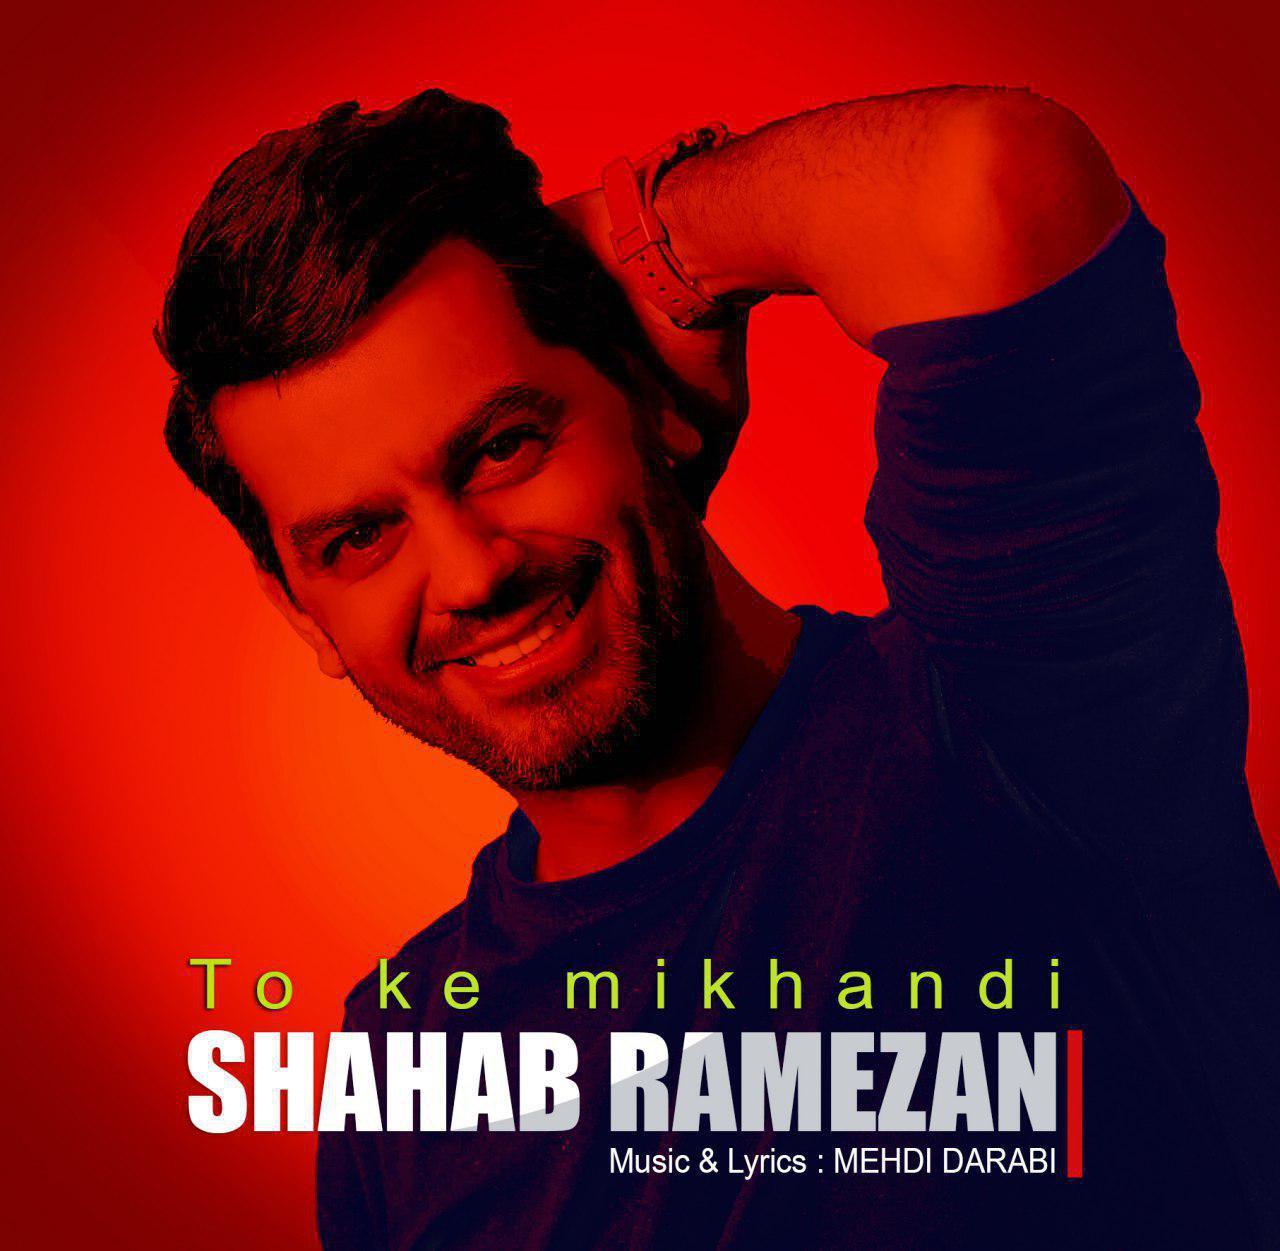 Shahab Ramezan - To Ke Mikhandi Music | آهنگ شهاب رمضان - تو که میخندی